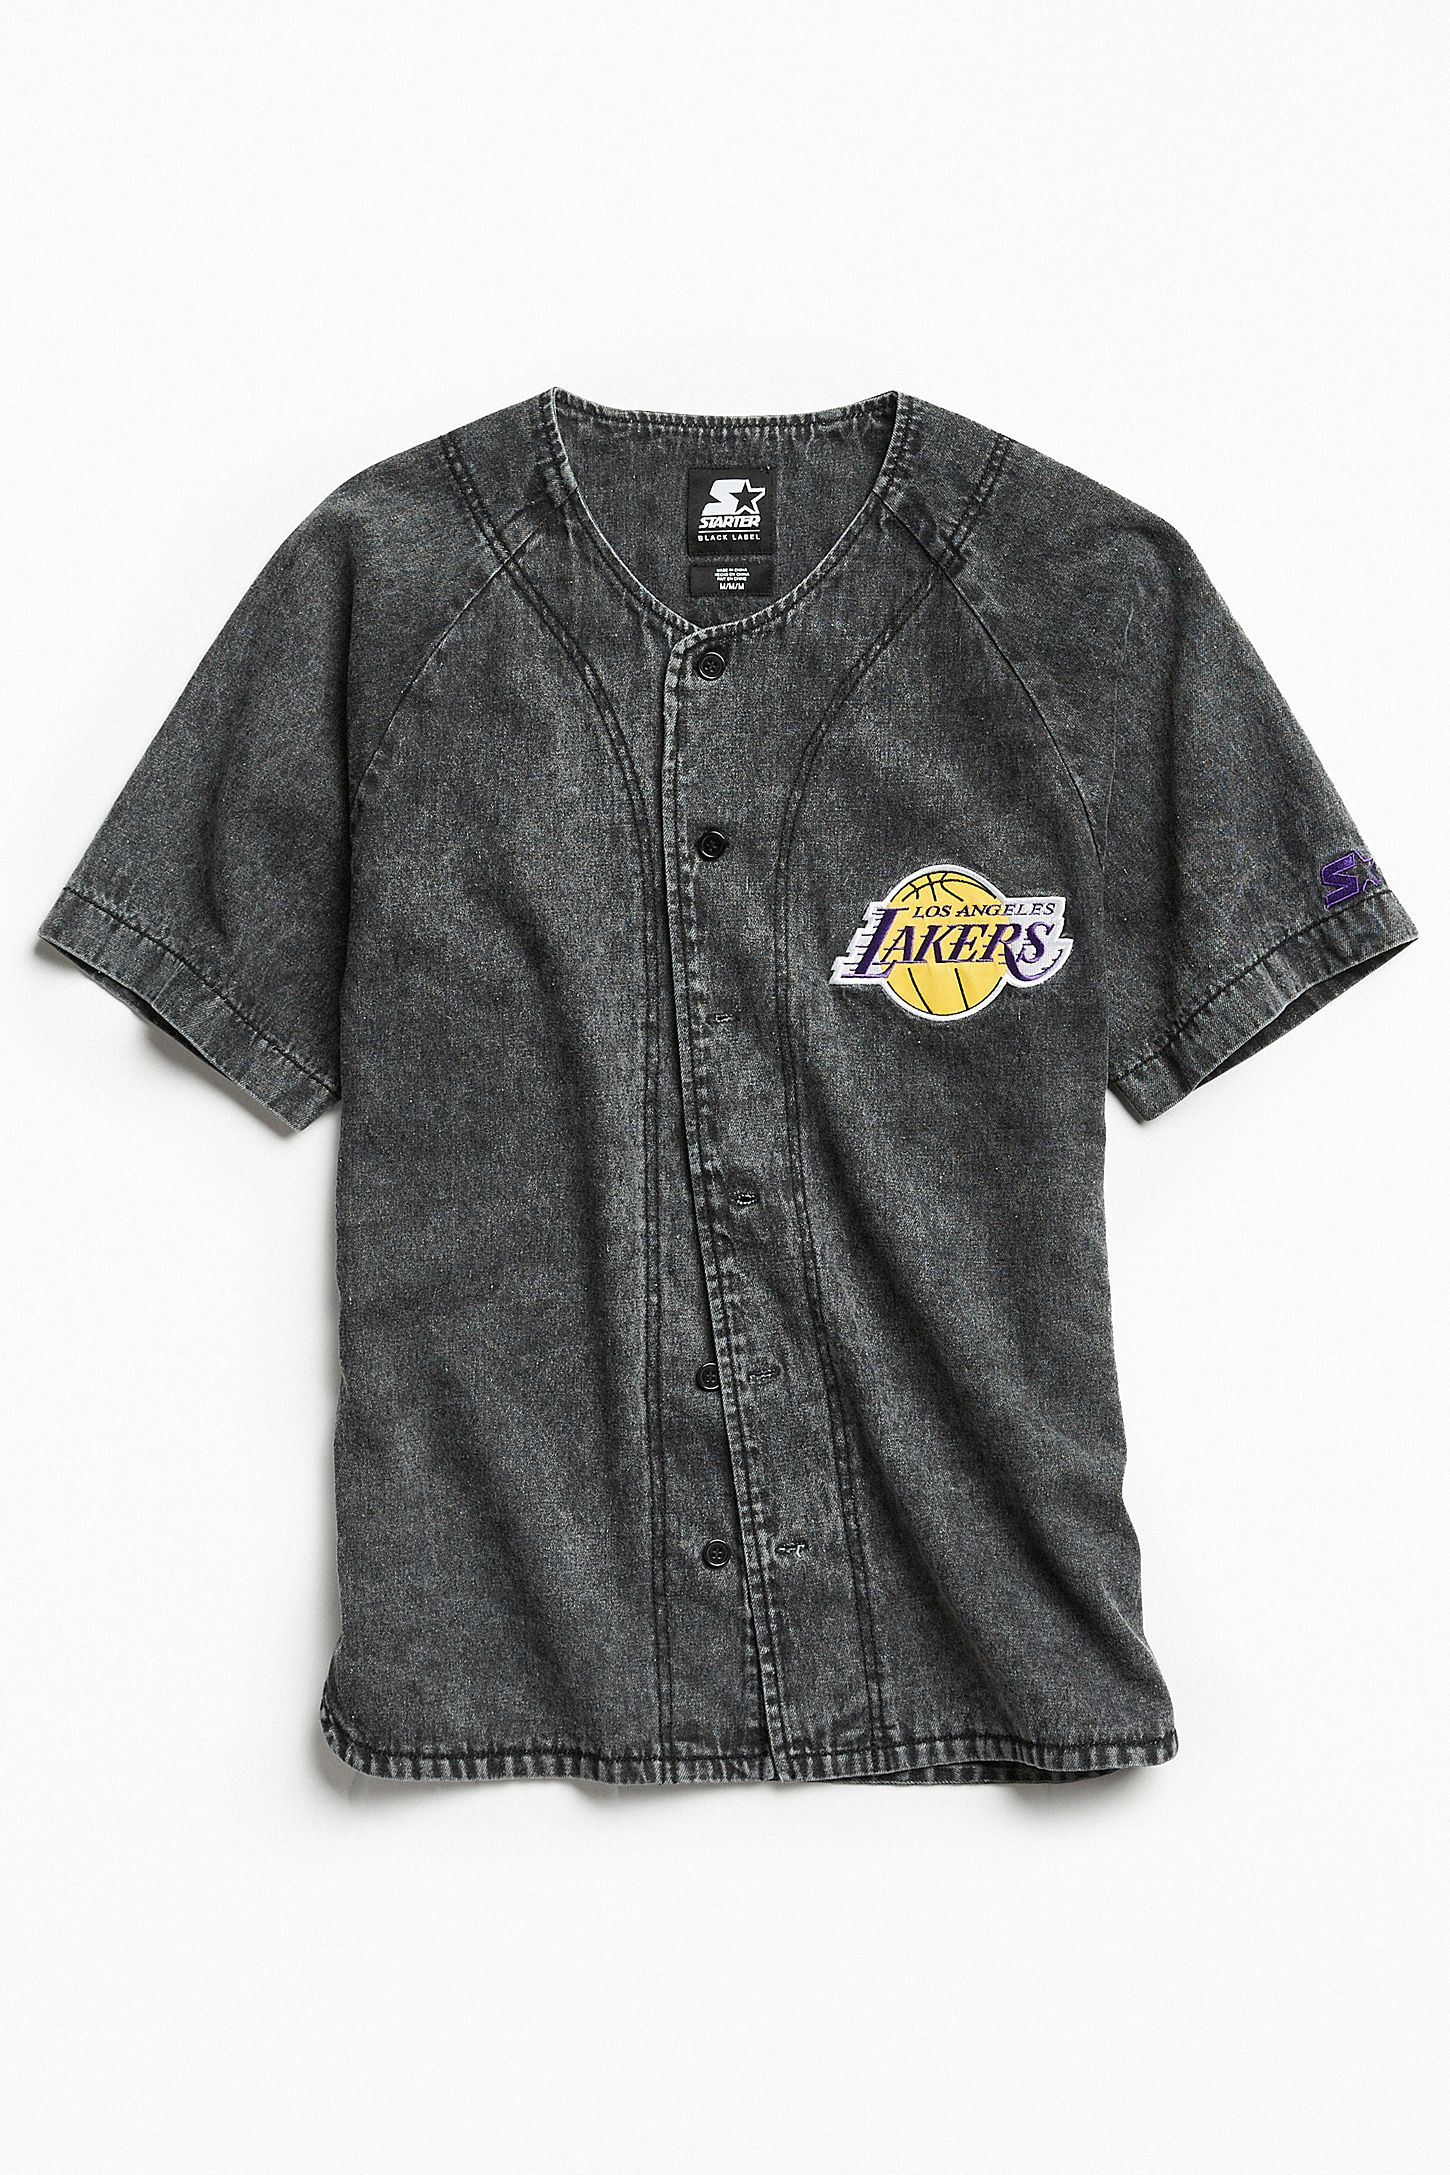 d9987ca5b94 Starter Black Label + UO NBA Los Angeles Lakers Denim Baseball Shirt ...